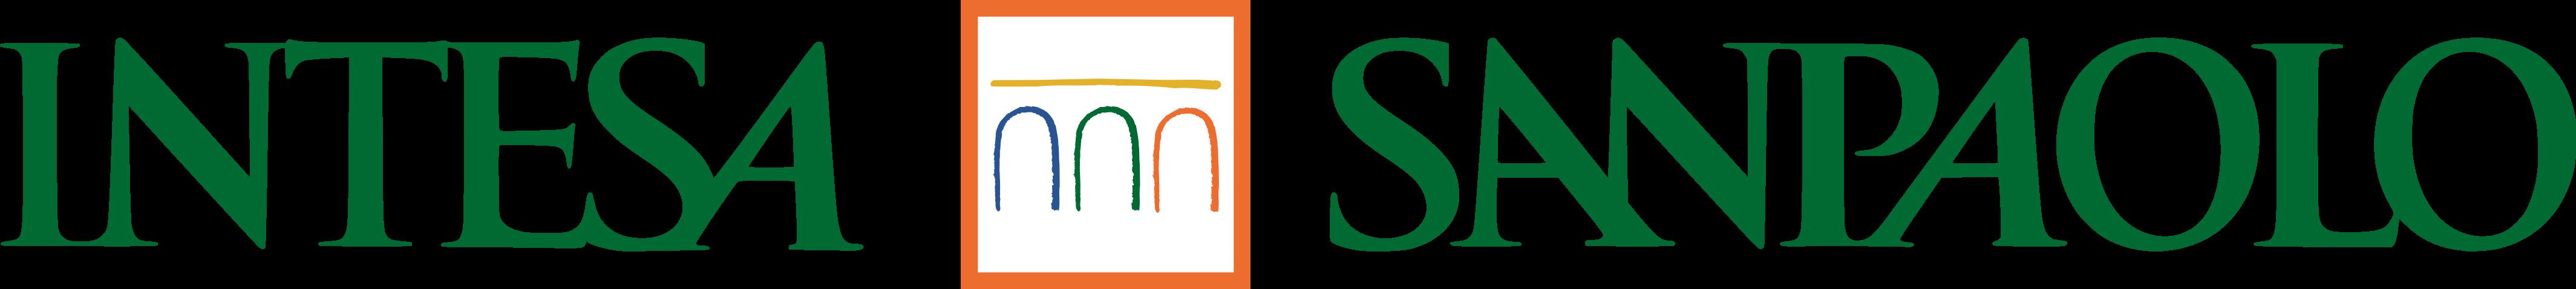 Intesa Sanpaolo ATMs